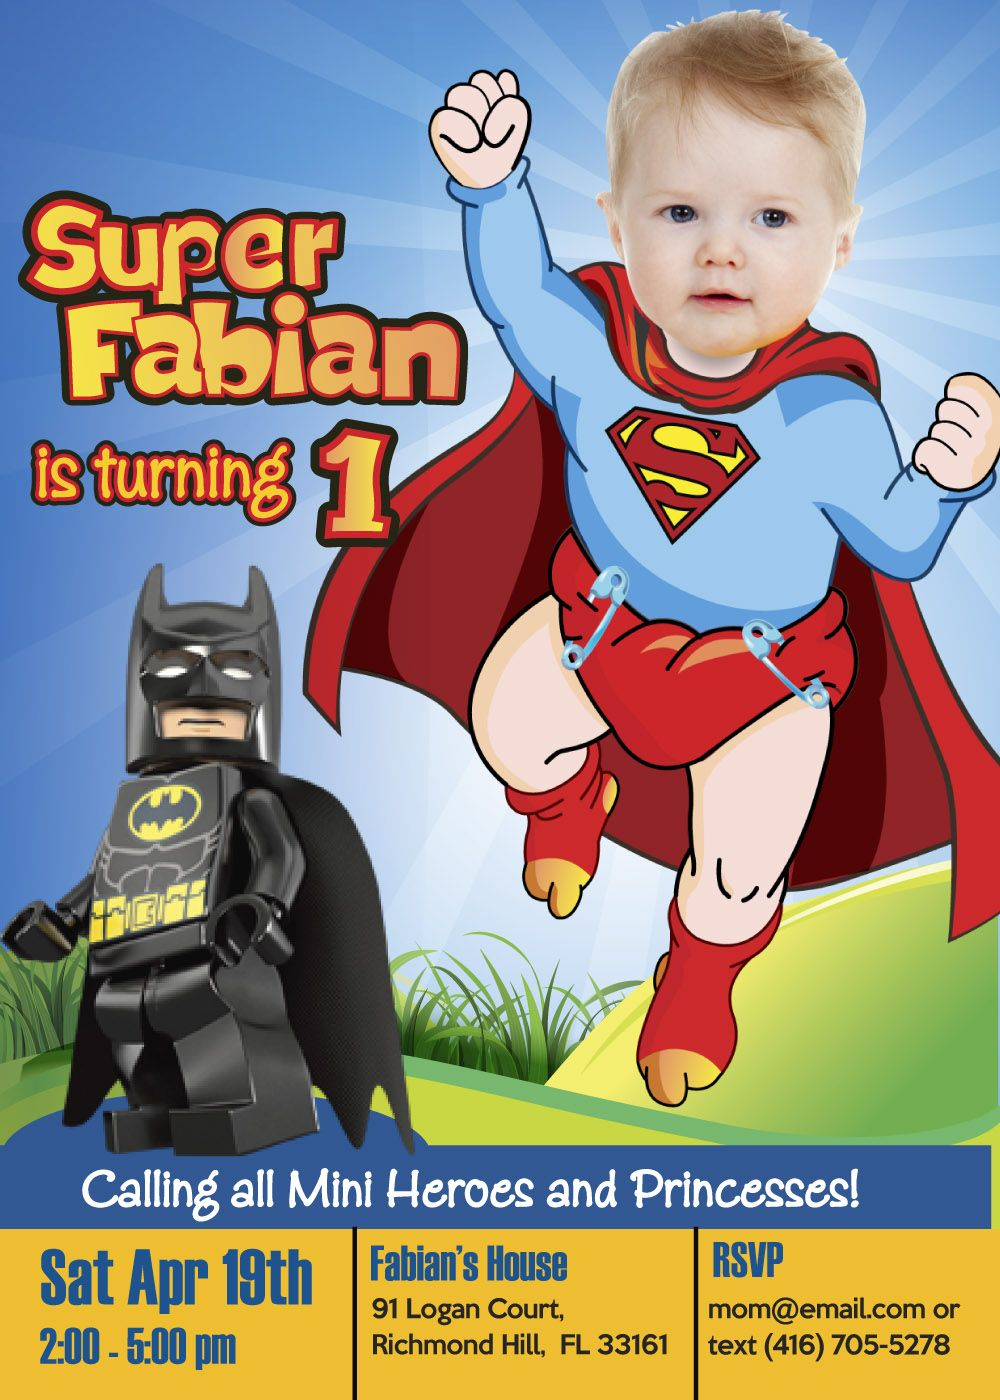 Pin by hanife muslu on superman | Pinterest | Superman invitations ...